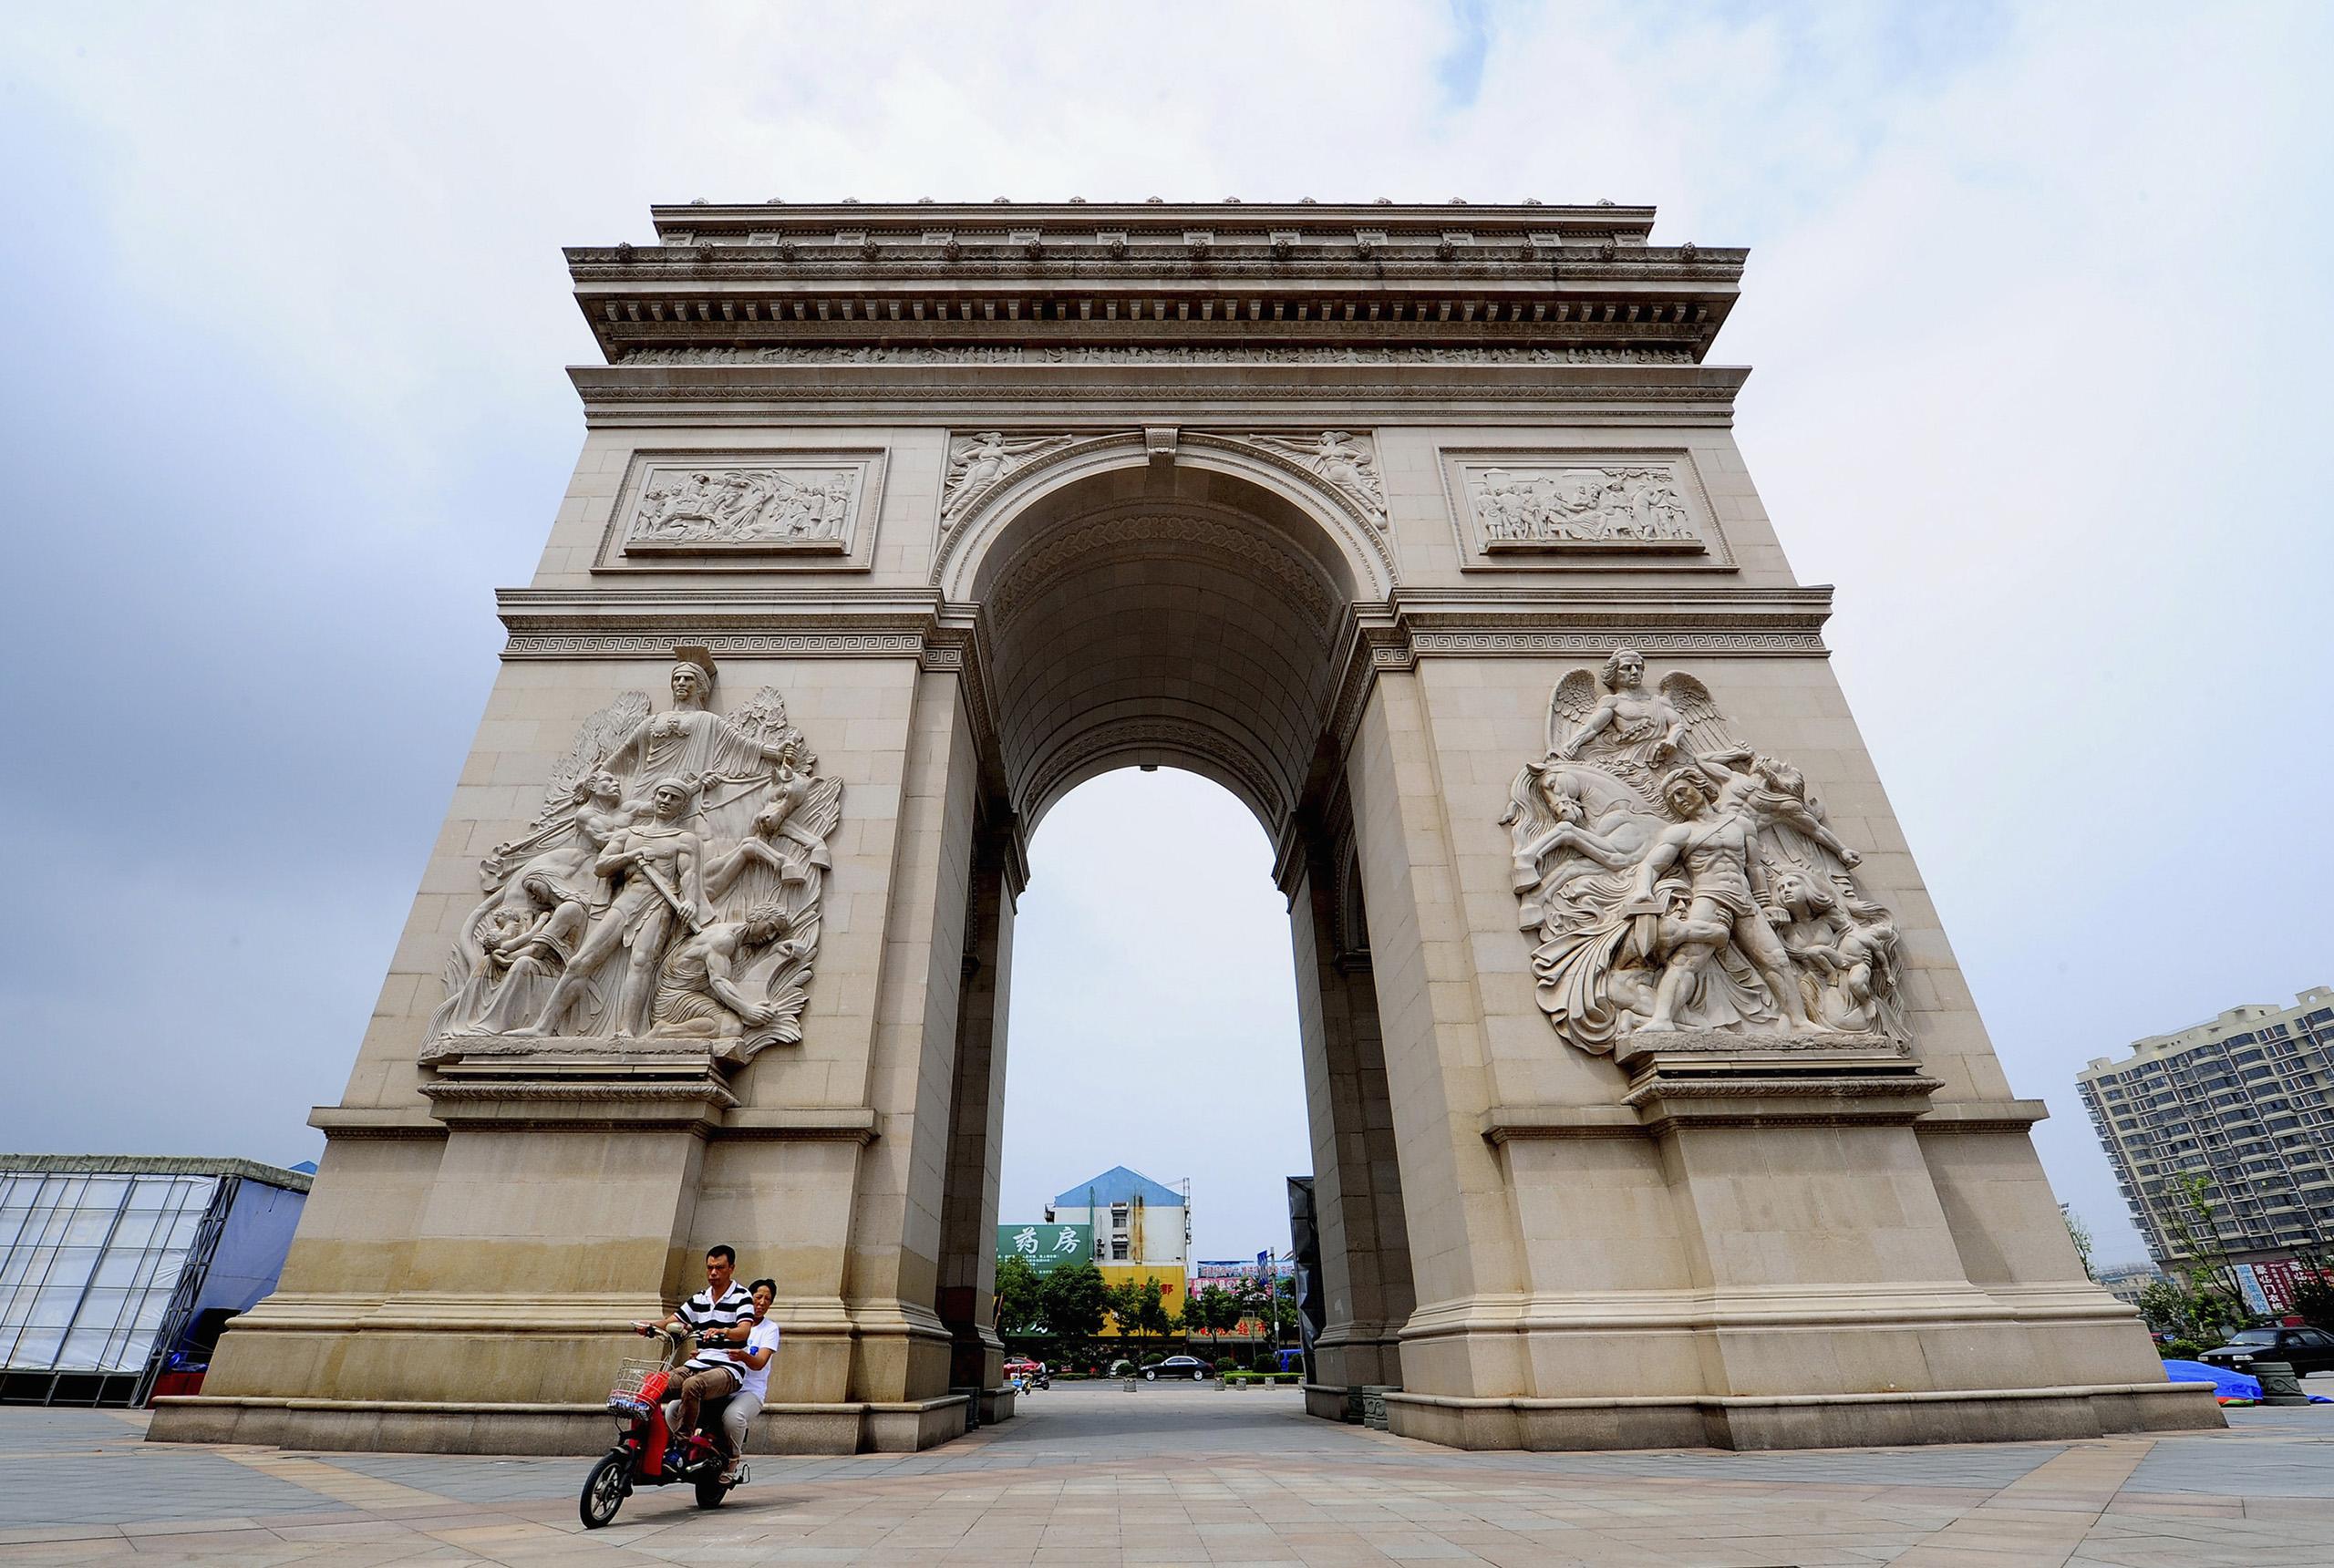 A motorcyclist rides past a 10-metre-high miniature replica of the Arc de Triomphe monument in Paris, in Jiangyan, Jiangsu province.